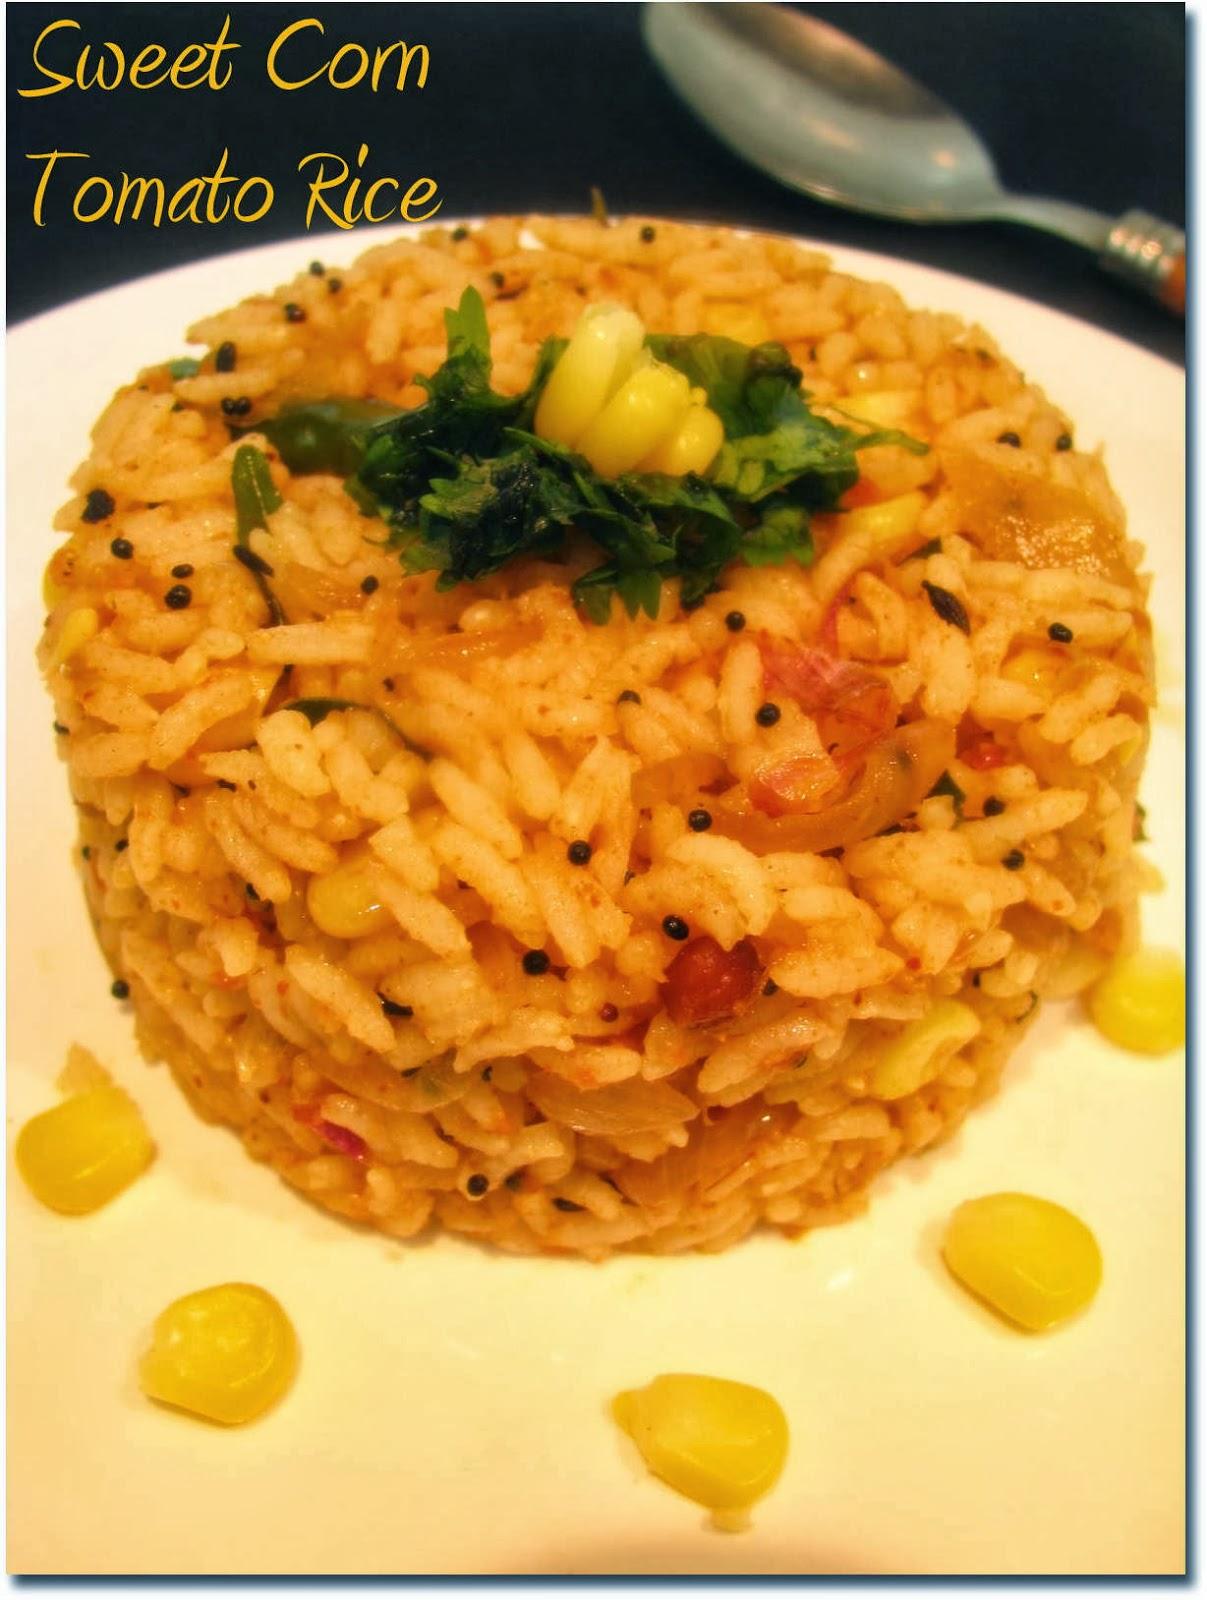 Sweet corn rice recipes sweet corn tomato rice bath recipe sweet corn rice recipes sweet corn tomato rice bath recipe ccuart Choice Image